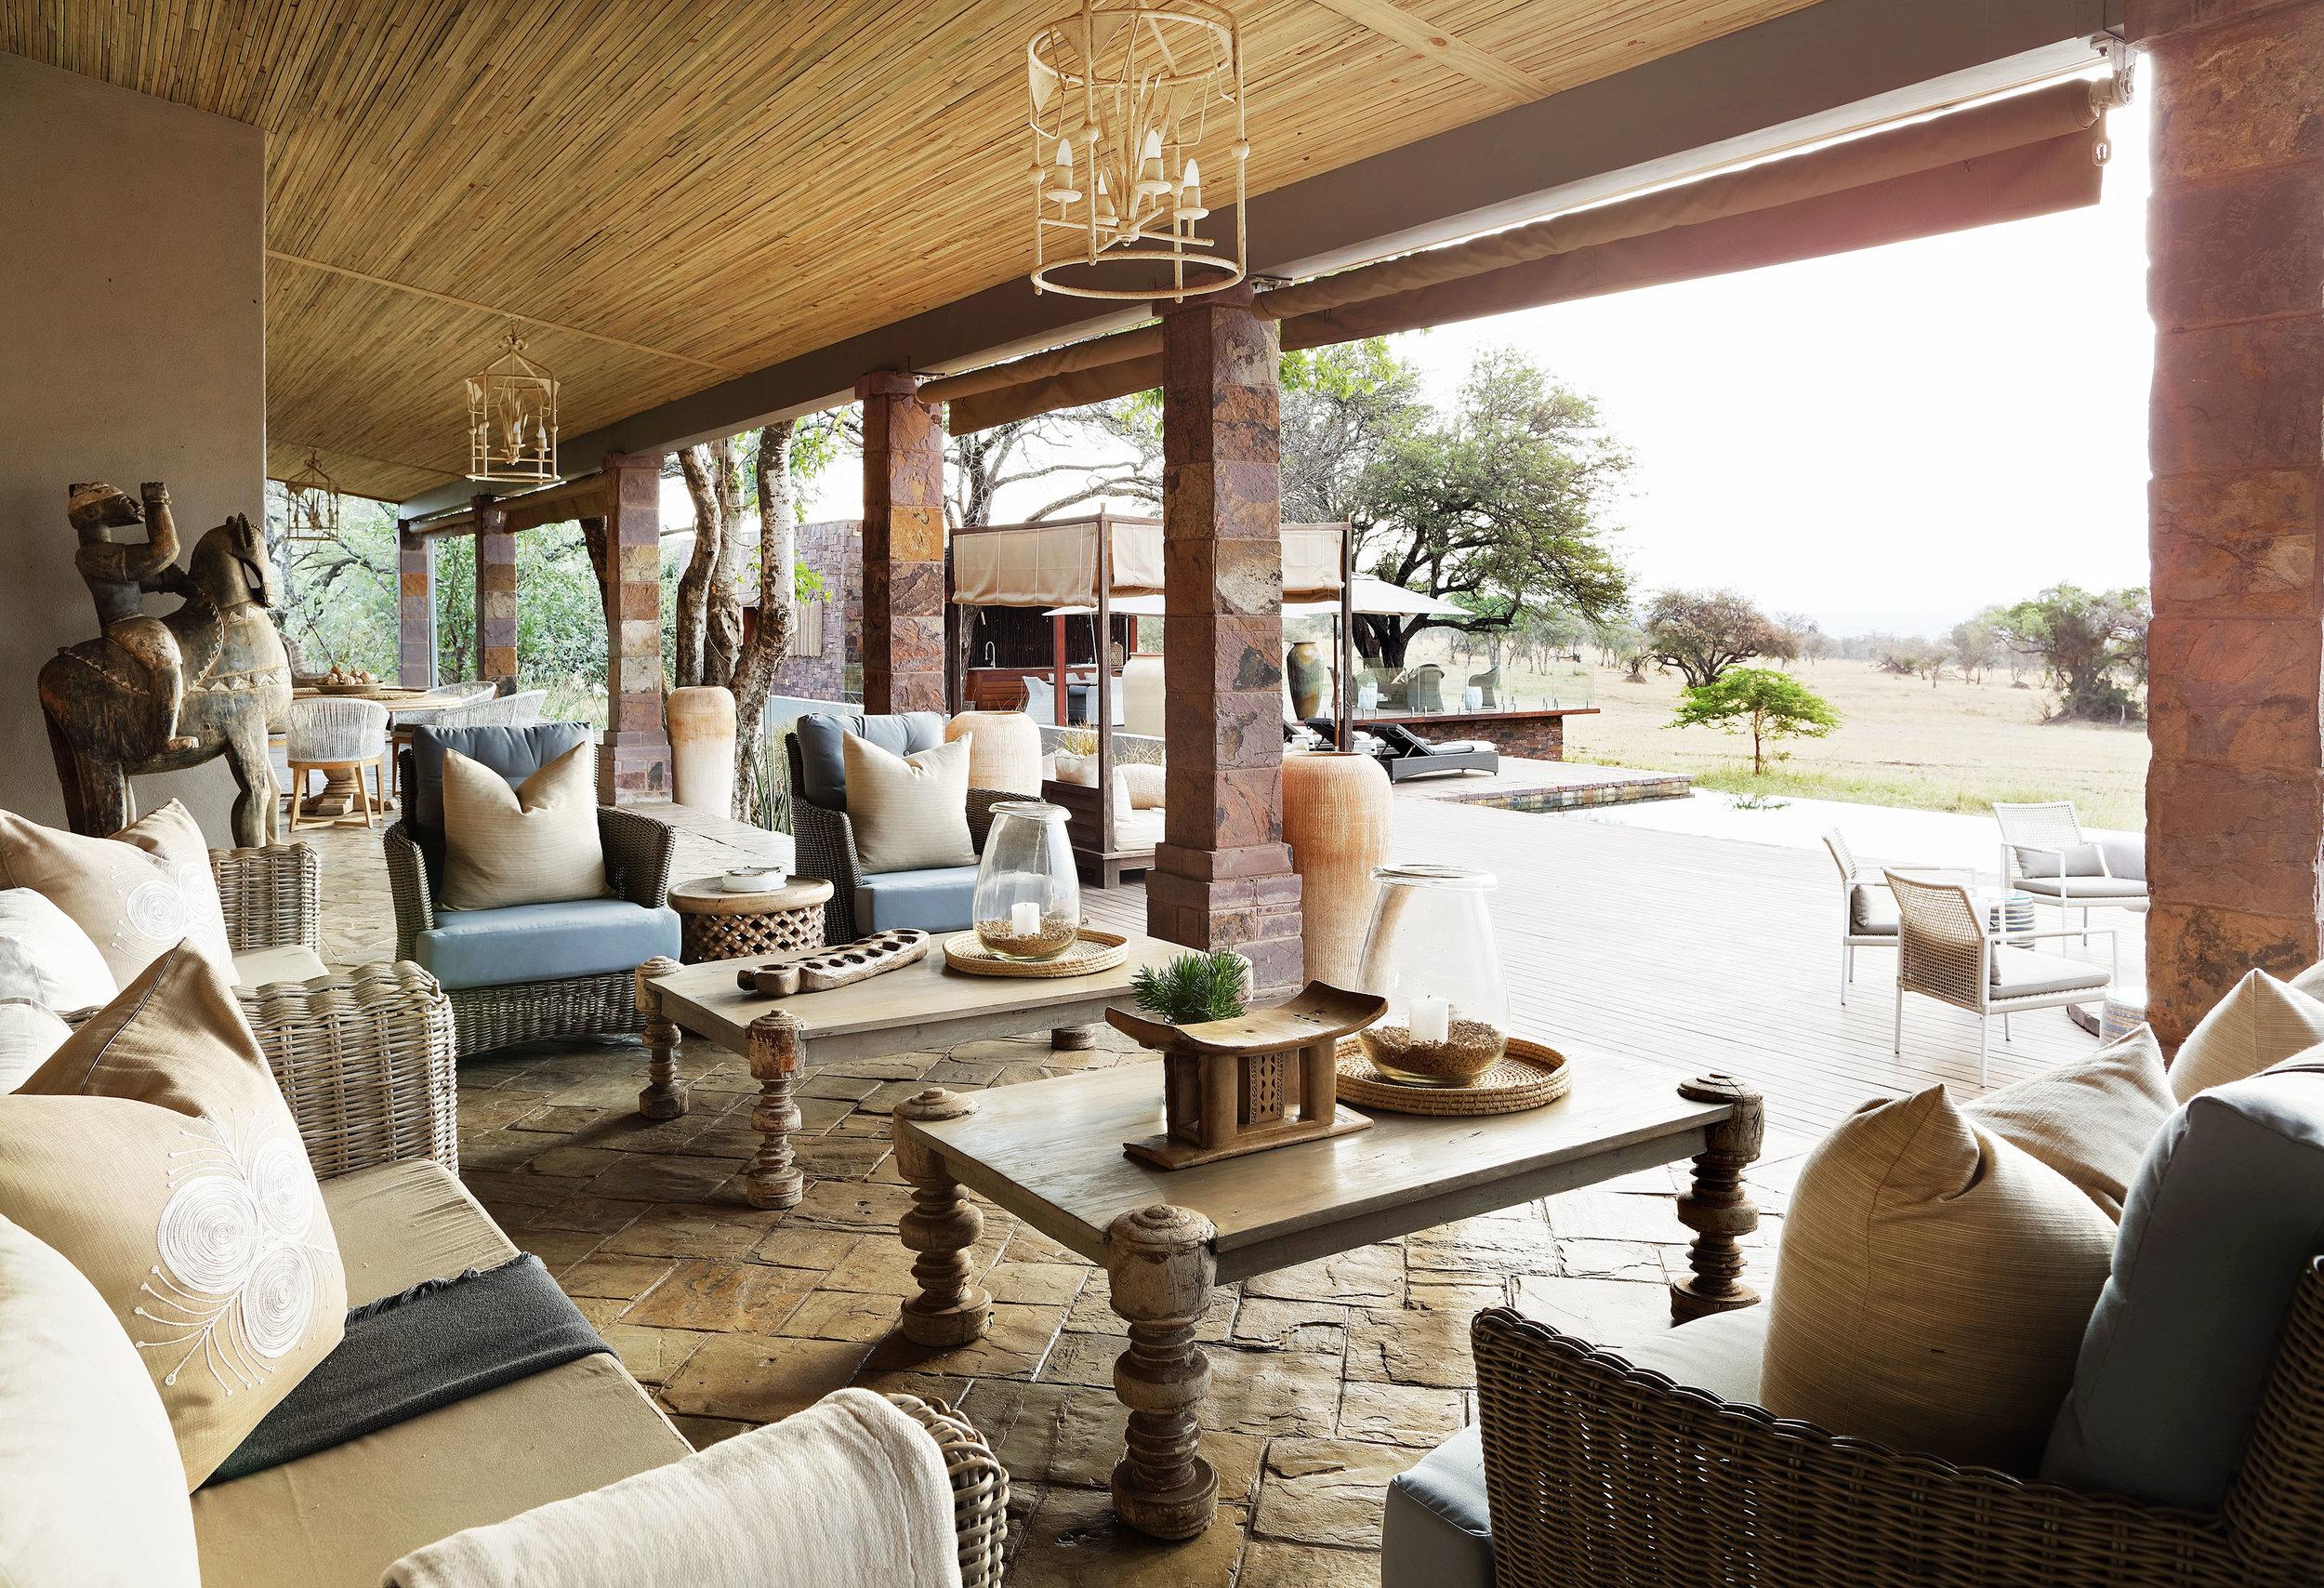 singita portfolio - serengeti house